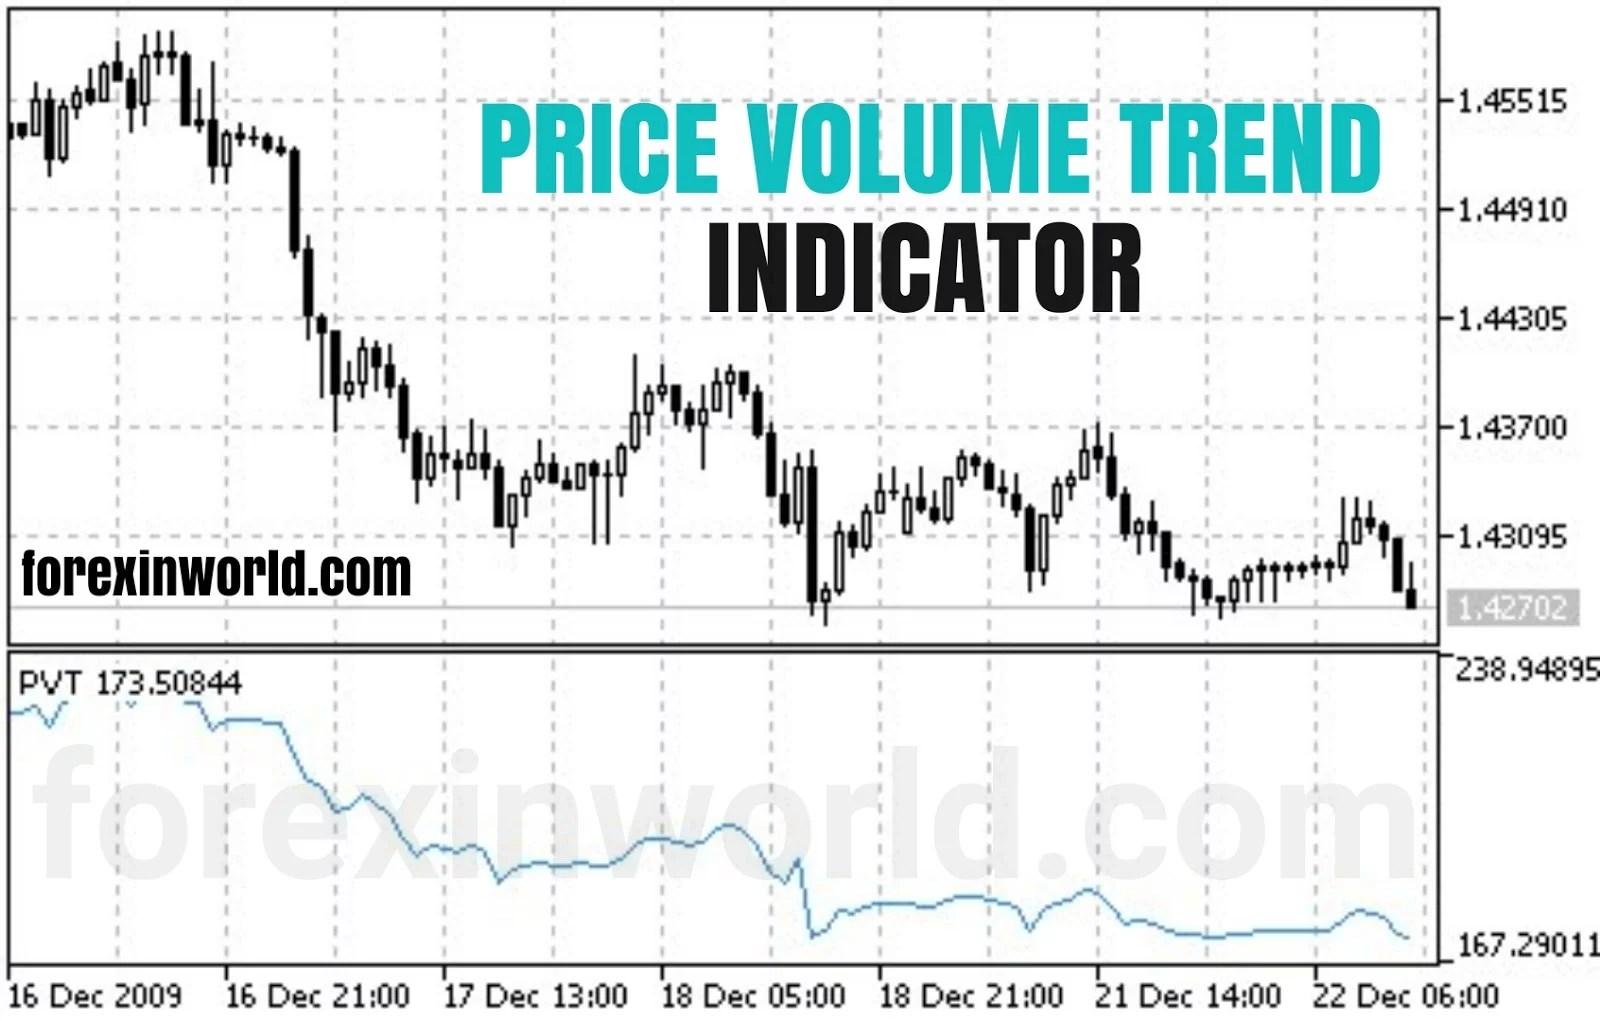 price volume trend indicator